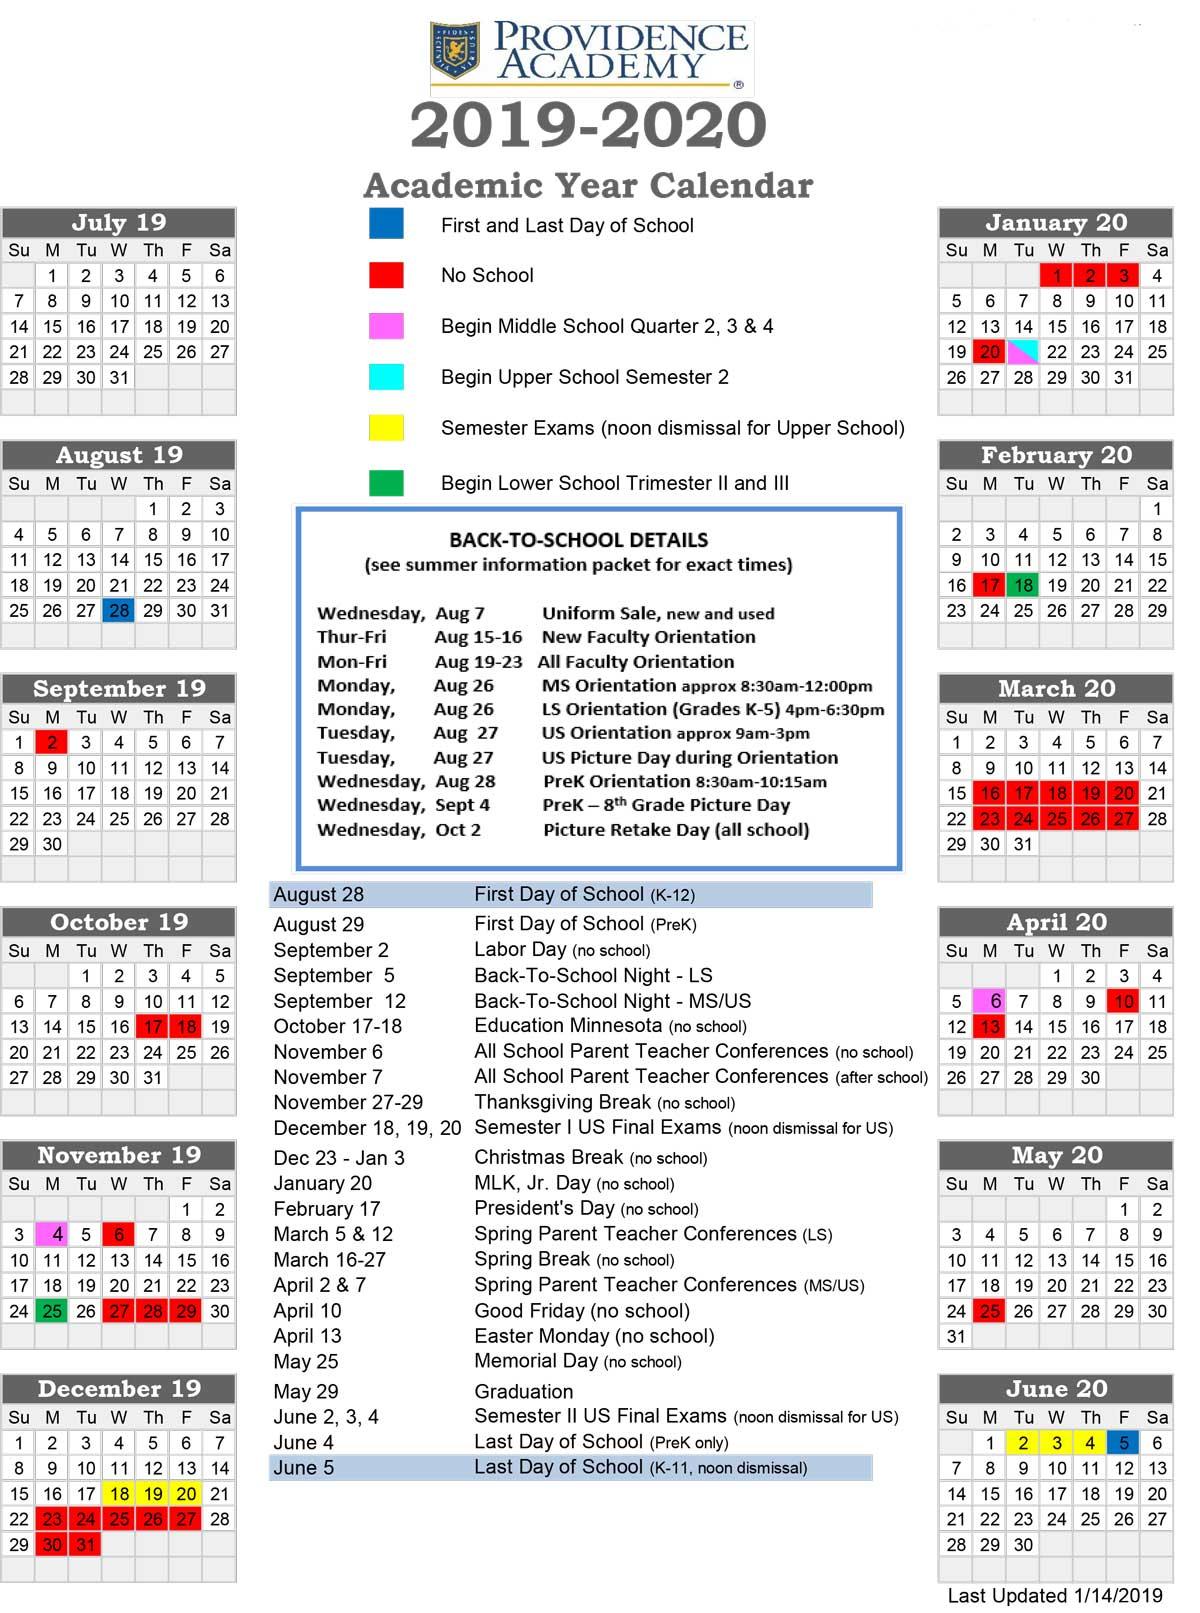 Academic Calendar - Providence Academy Regarding Univ Of Mn Academic Calendar Twin City Campus